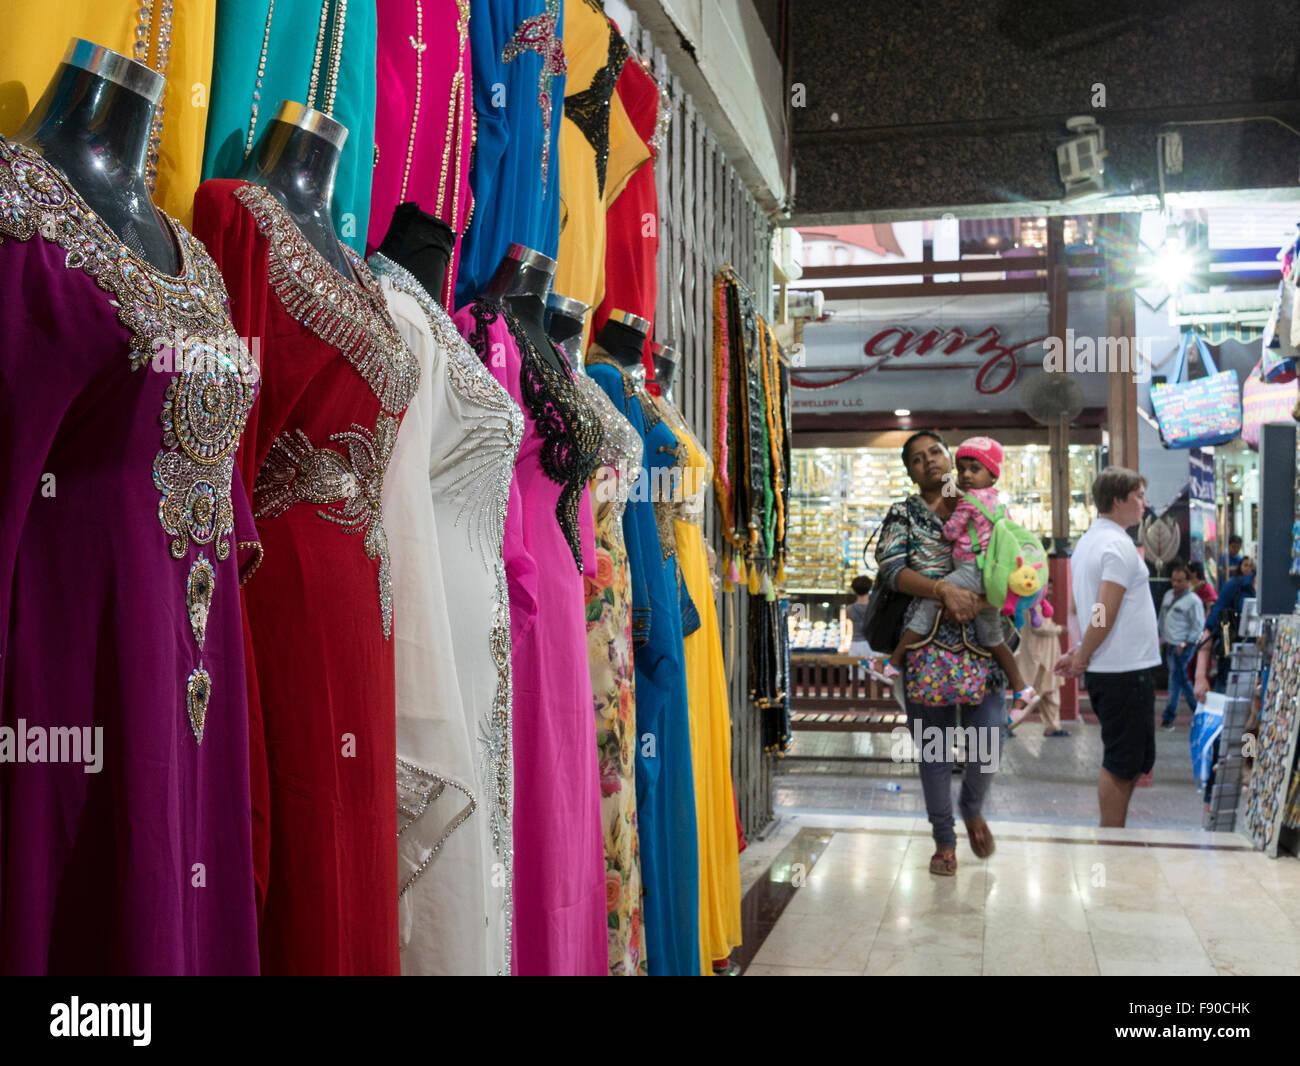 Tourists shopping in textile market (souk) in Dubai heritage